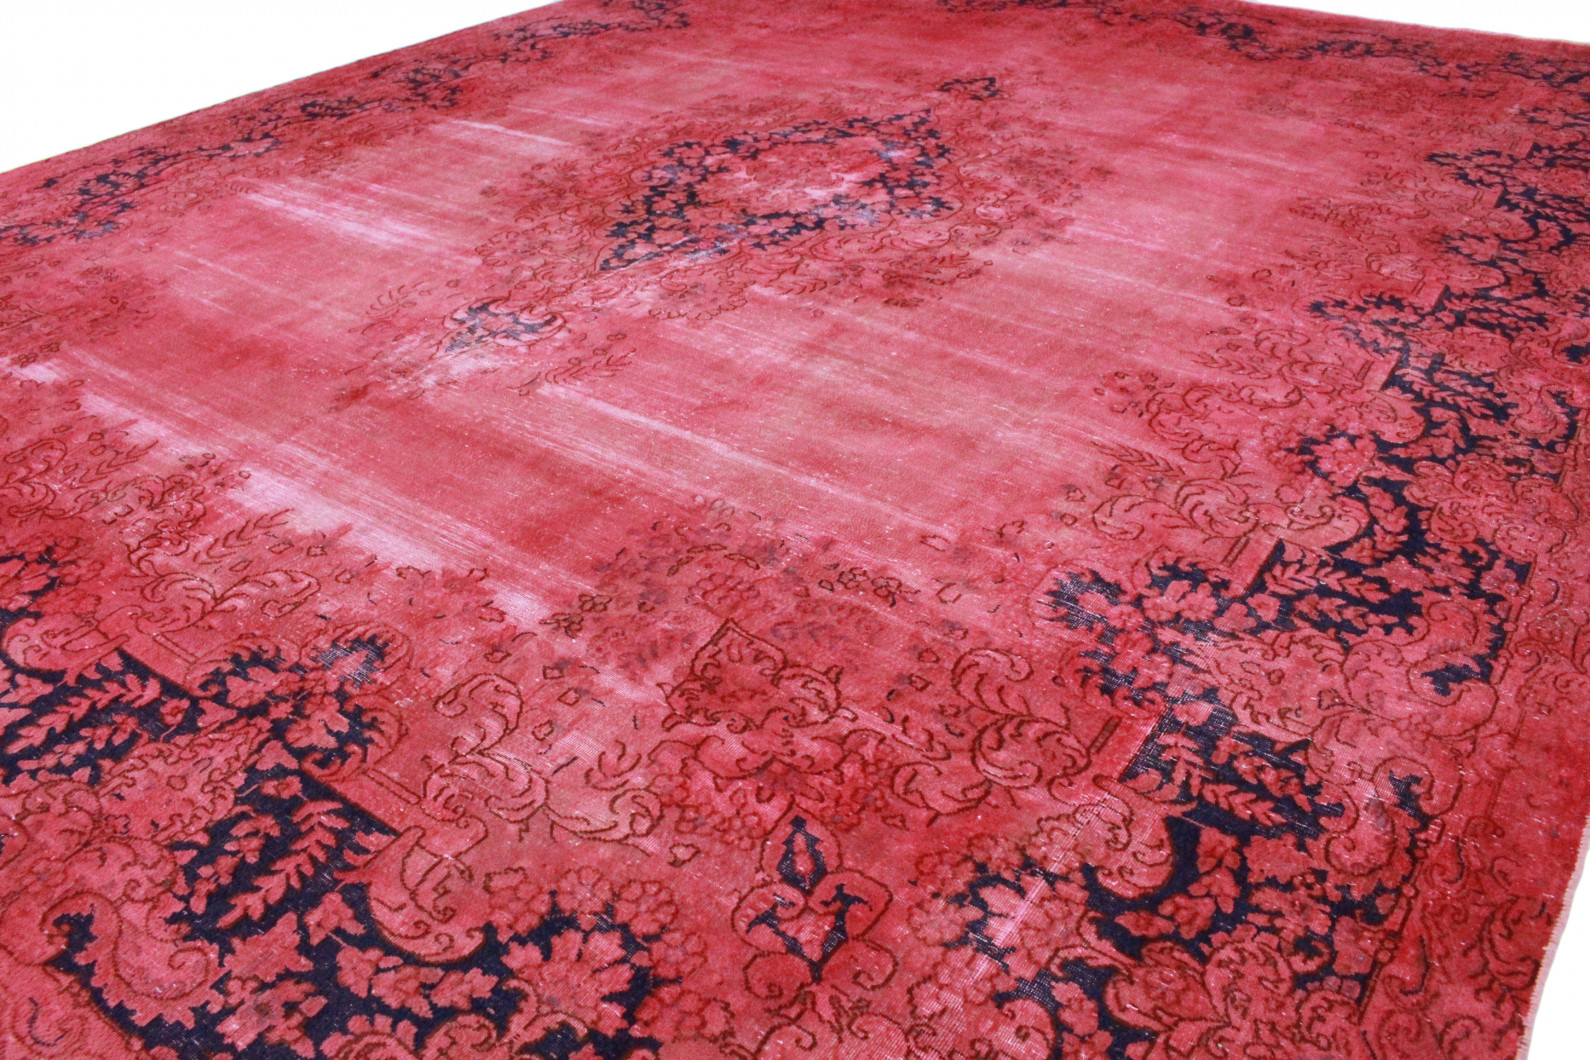 vintage teppich rosa rot in 380x290 1001 3590 bei kaufen. Black Bedroom Furniture Sets. Home Design Ideas